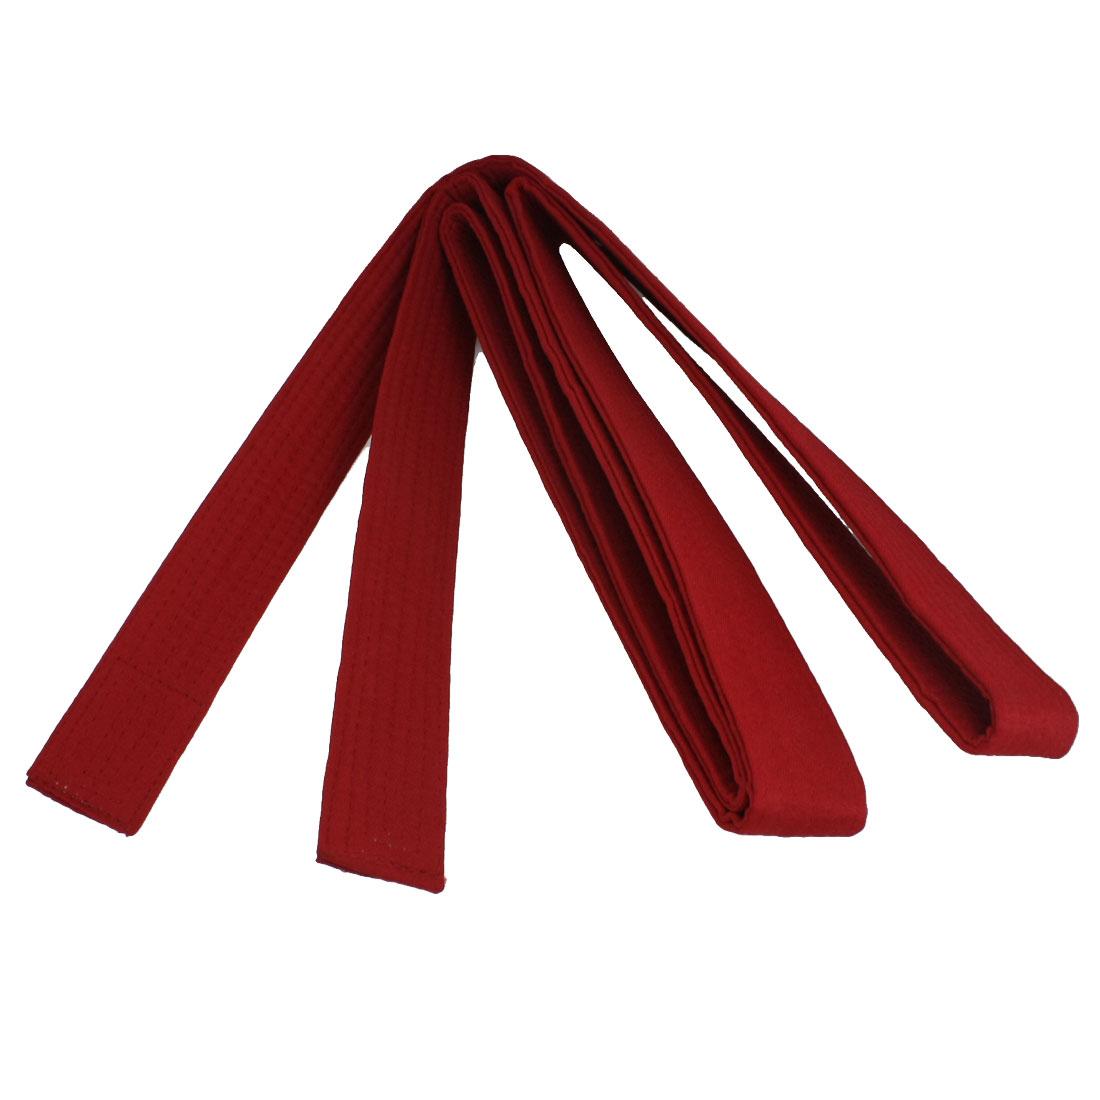 9Ft Length Martial Arts Karate Taekwondo Judo Dark Red Nylon Band Belt